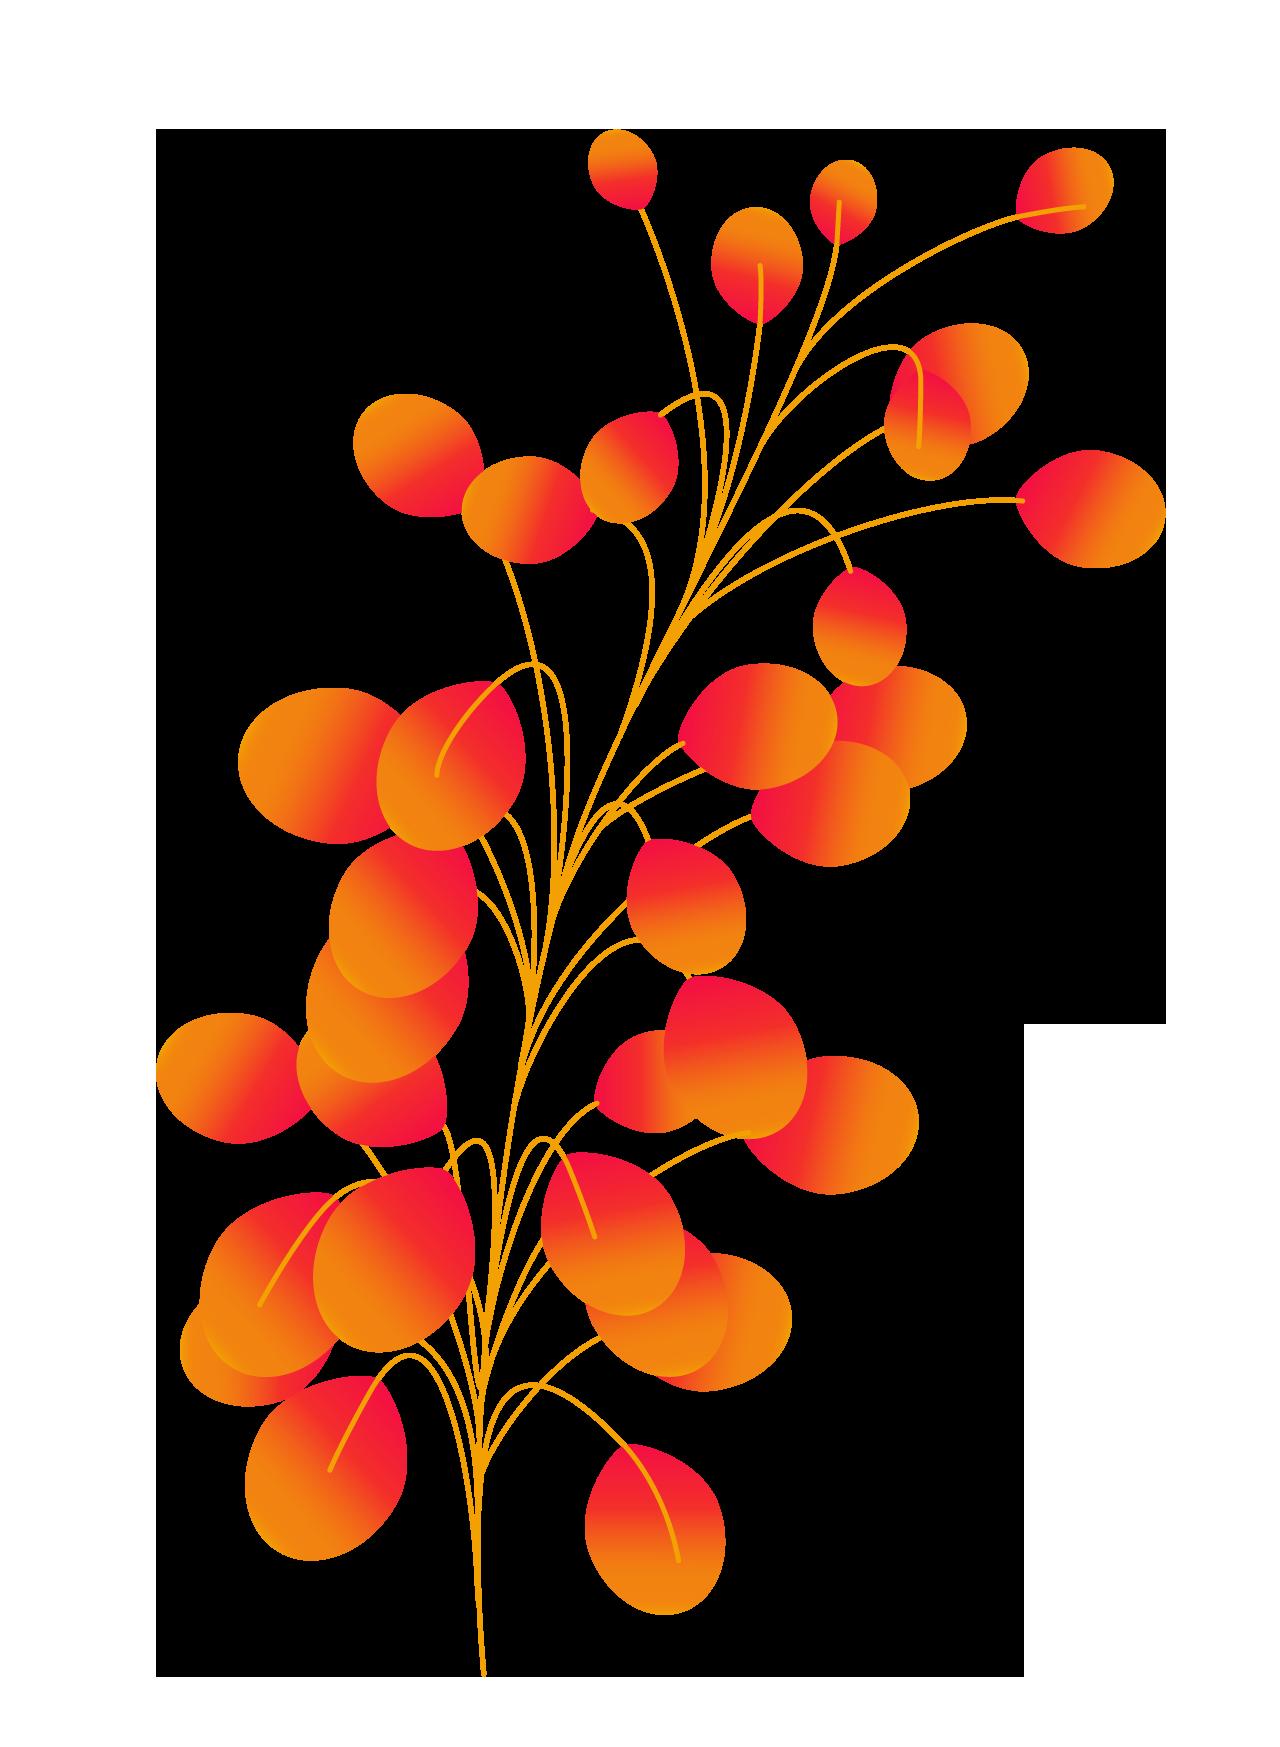 Plants01_